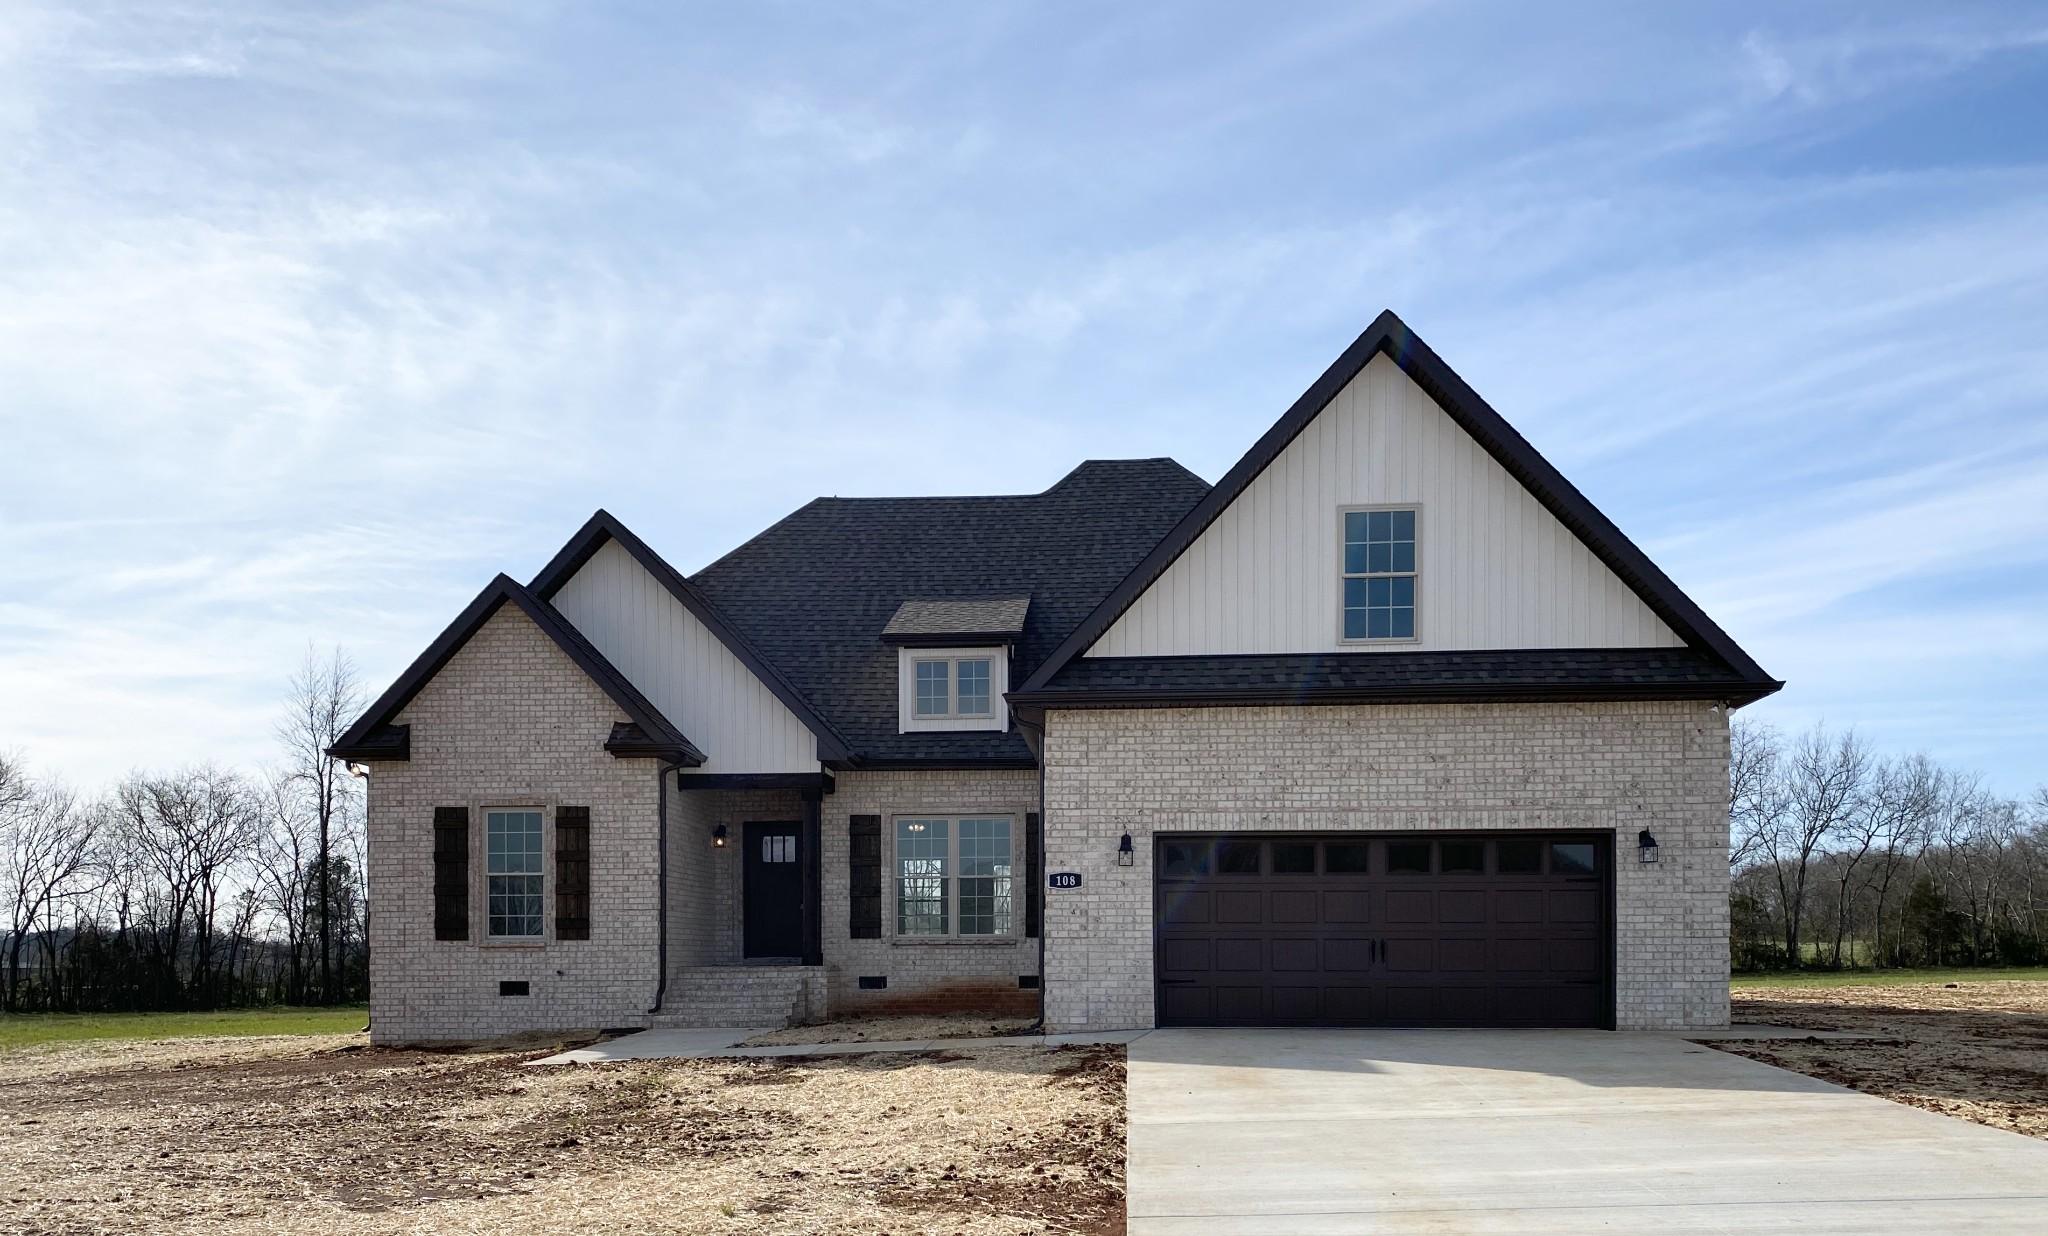 108 Northside Lane, Unionville, TN 37180 - Unionville, TN real estate listing